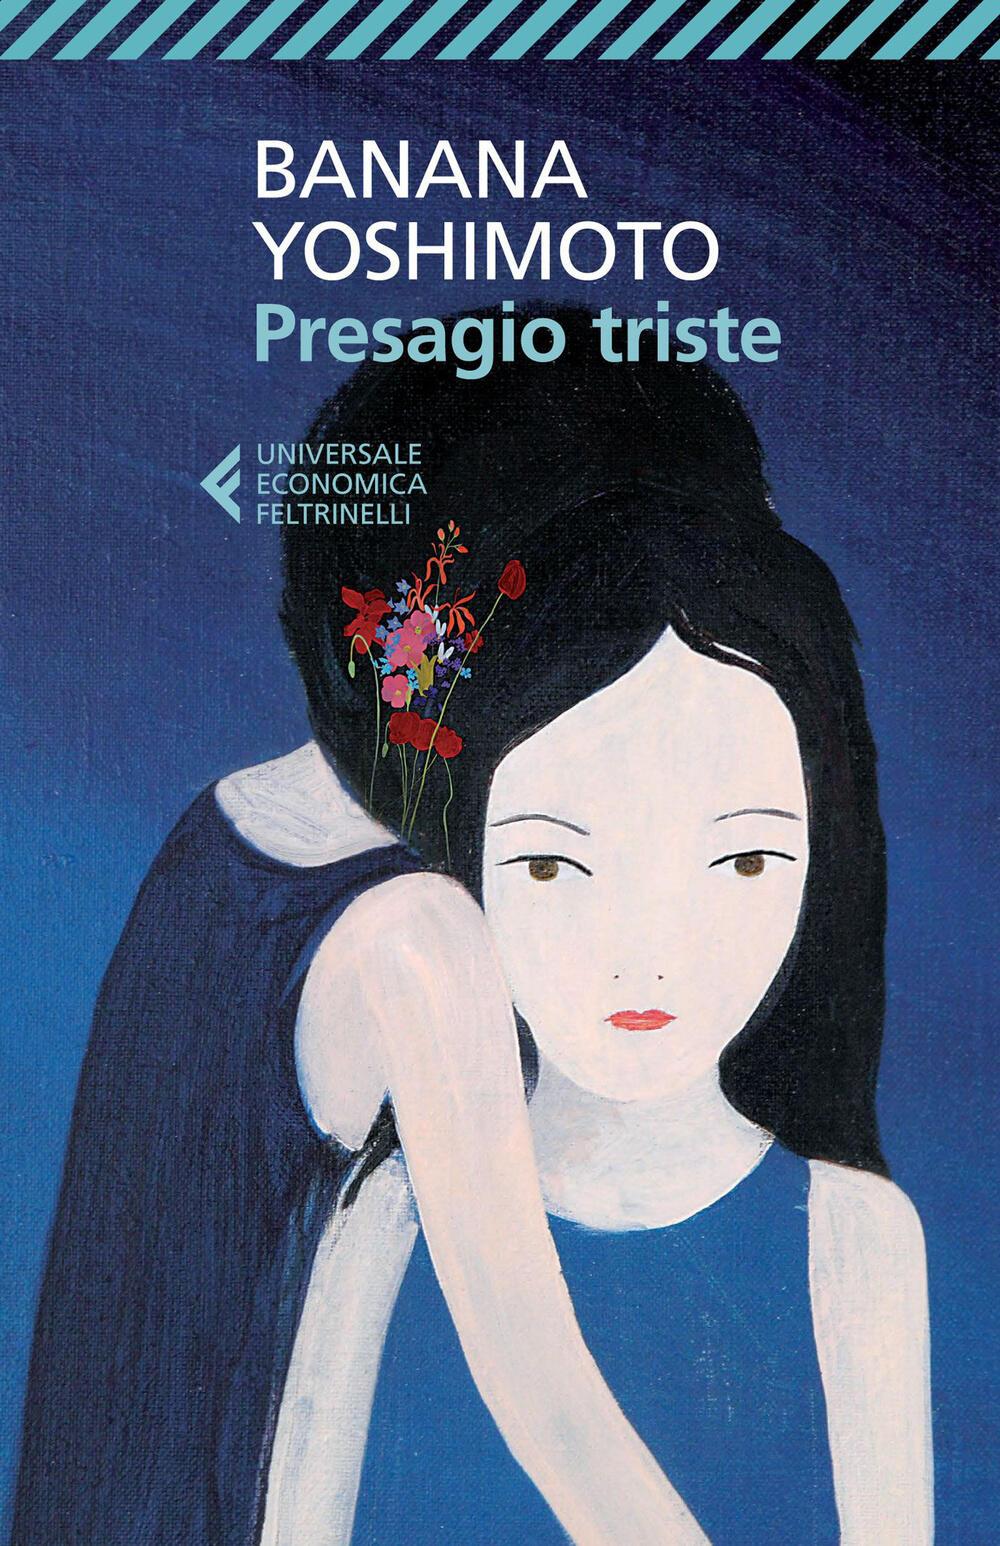 Presagio triste banana yoshimoto libro feltrinelli - Il giardino segreto banana yoshimoto ...